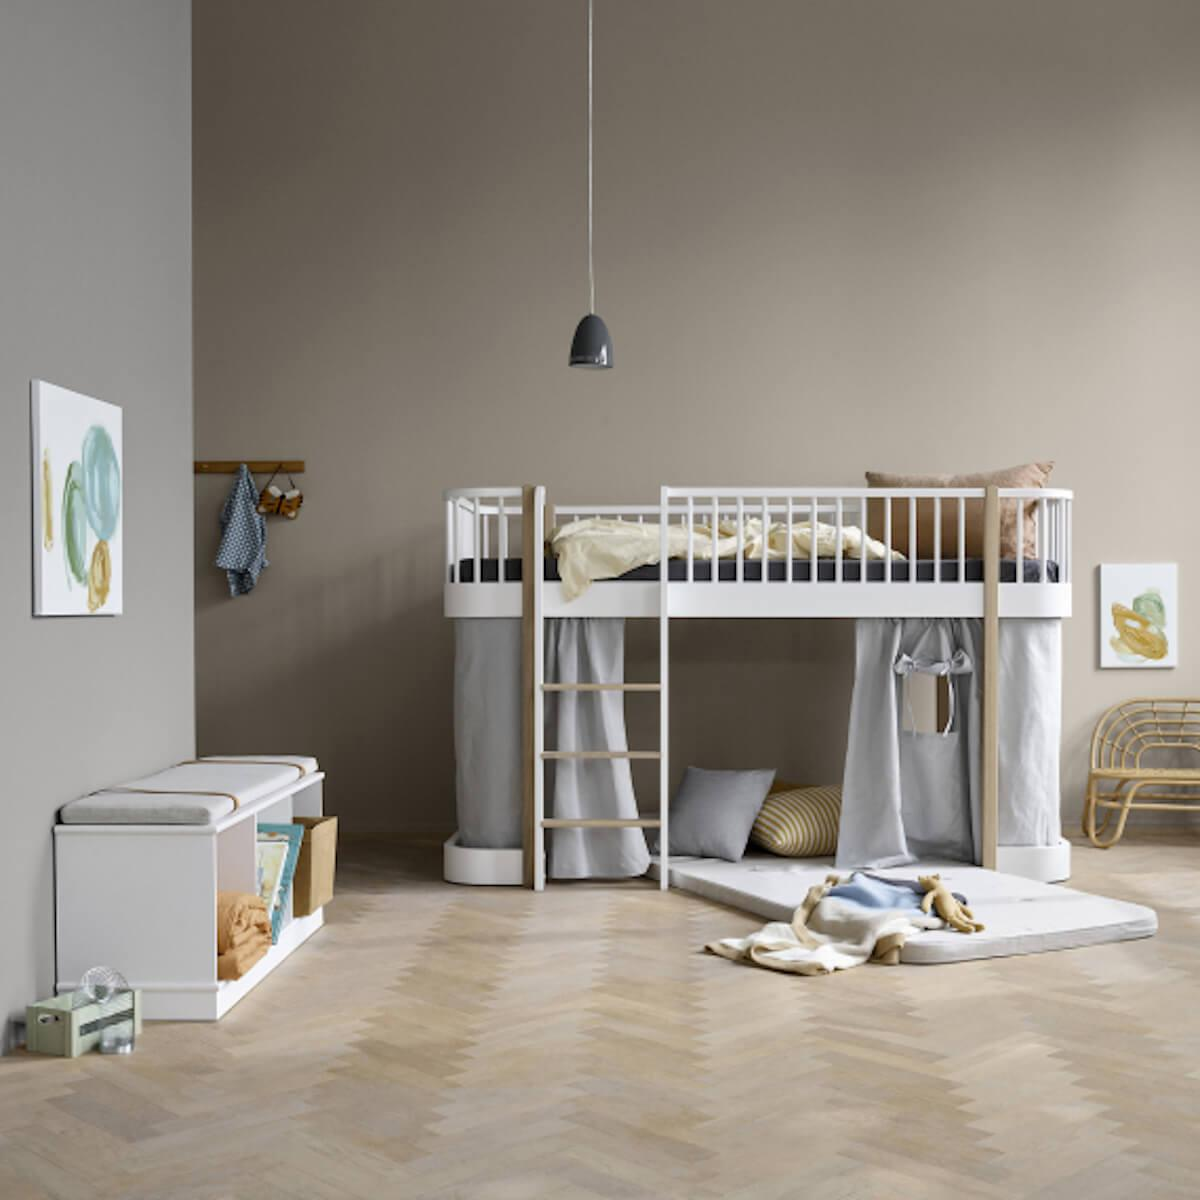 Colchón juegos 90x200cm cama media alta WOOD Oliver Furniture